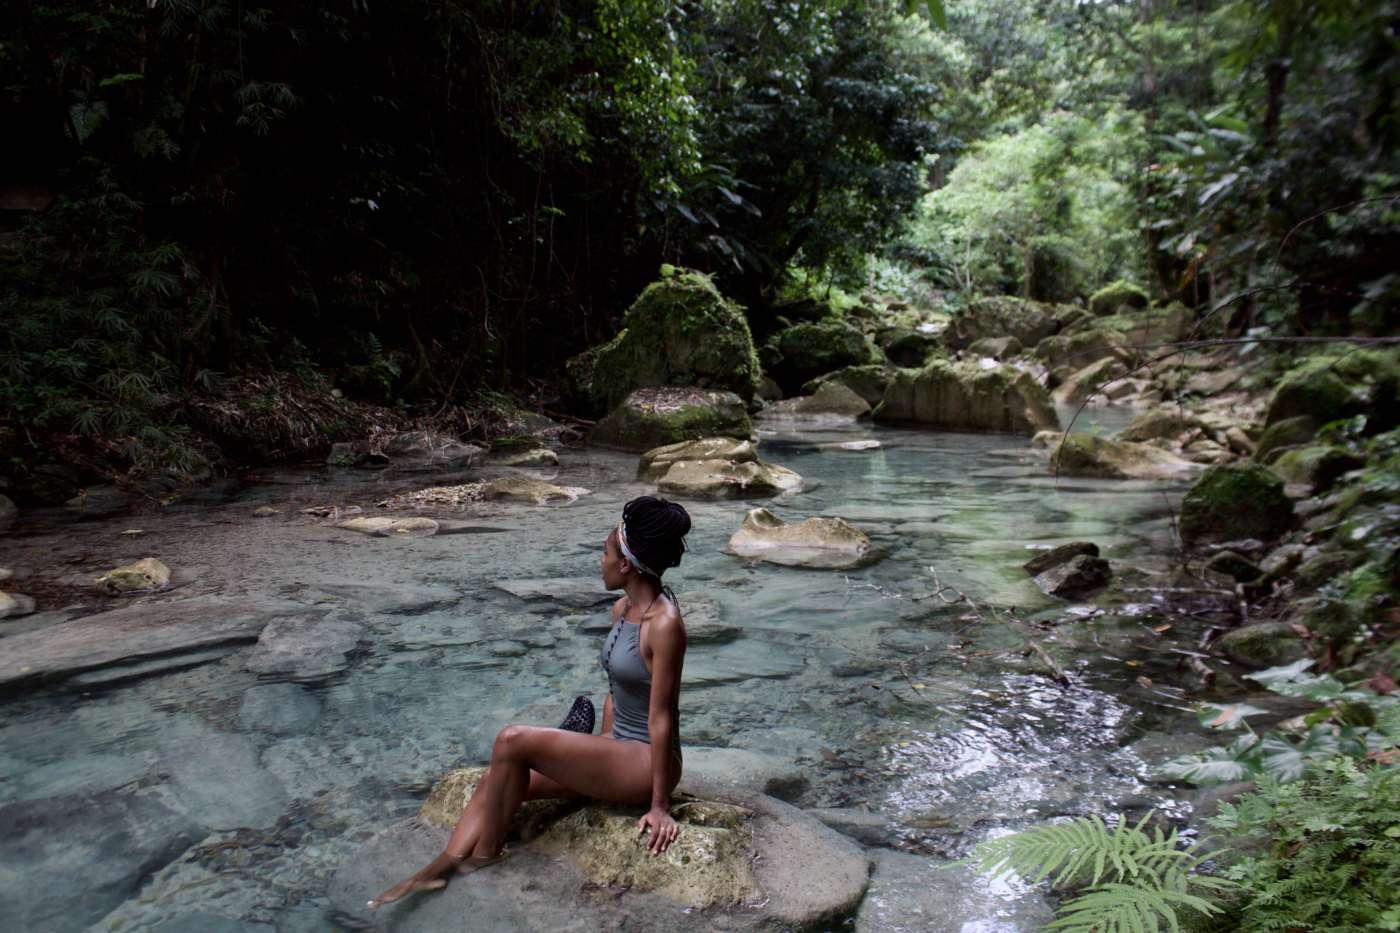 secret-places-to-visit-in-portland-jamaica